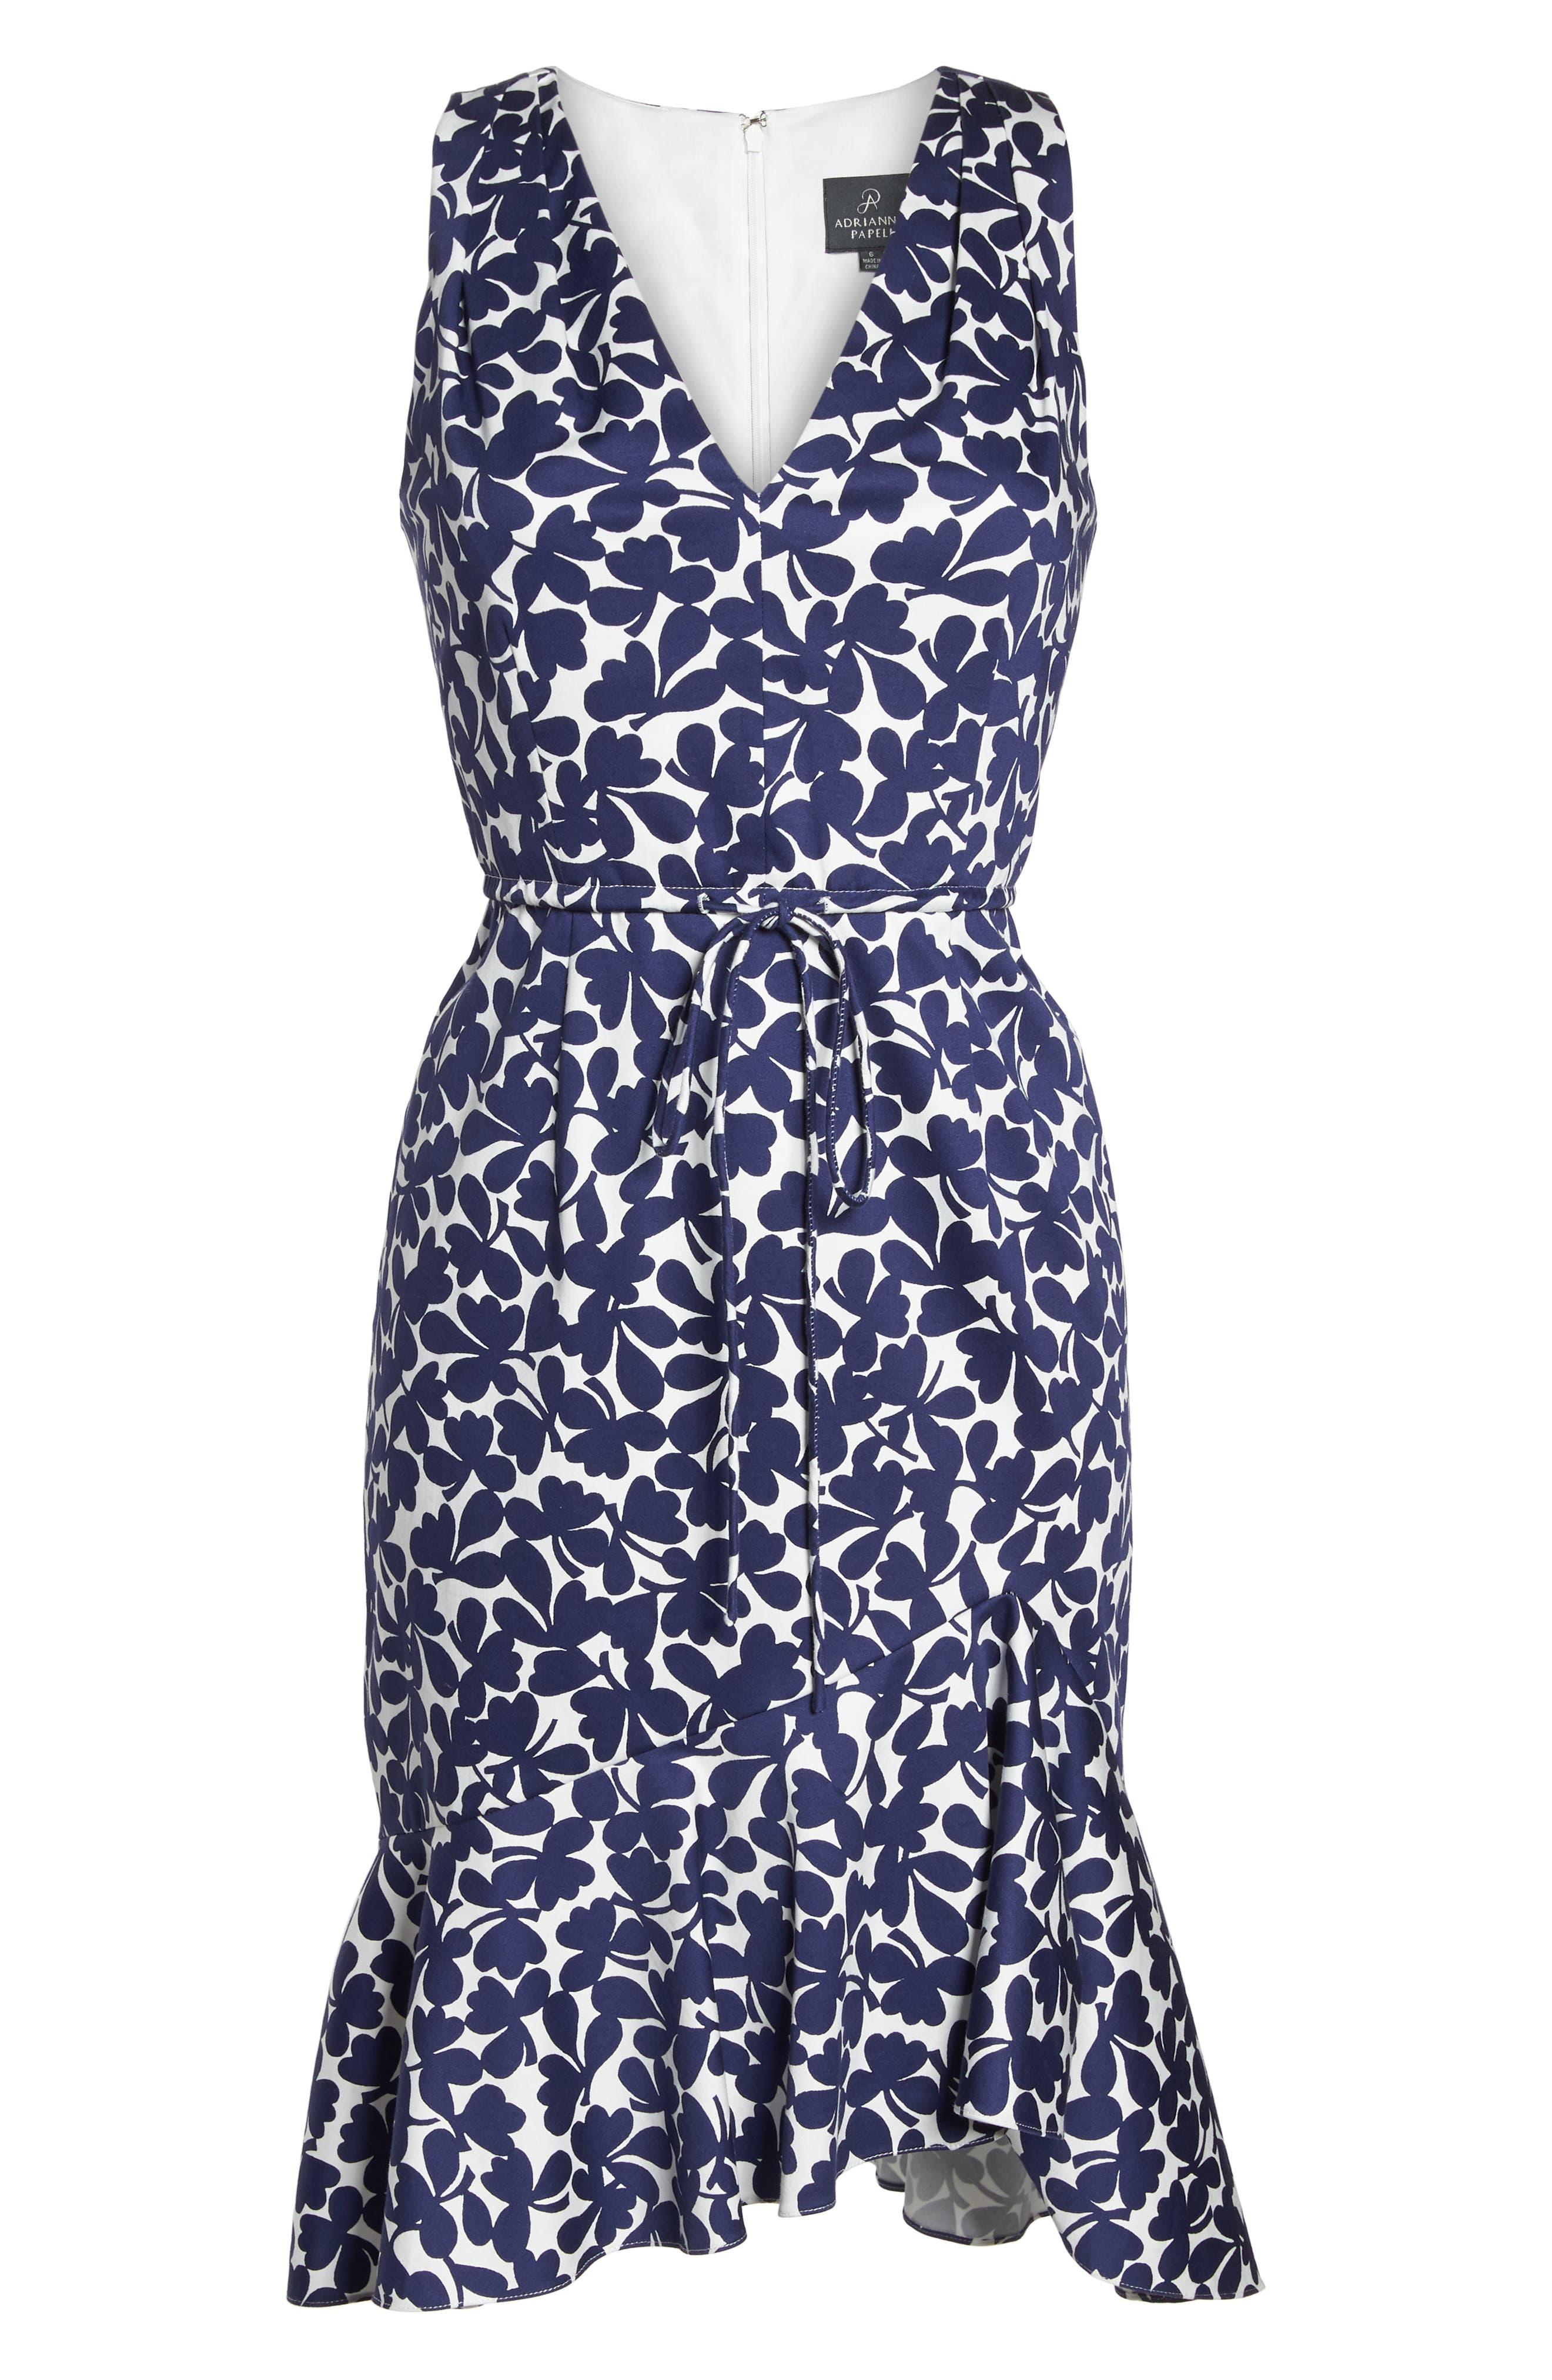 Lady Luck Print Cotton Sateen Dress,                             Alternate thumbnail 7, color,                             Navy/ Ivory